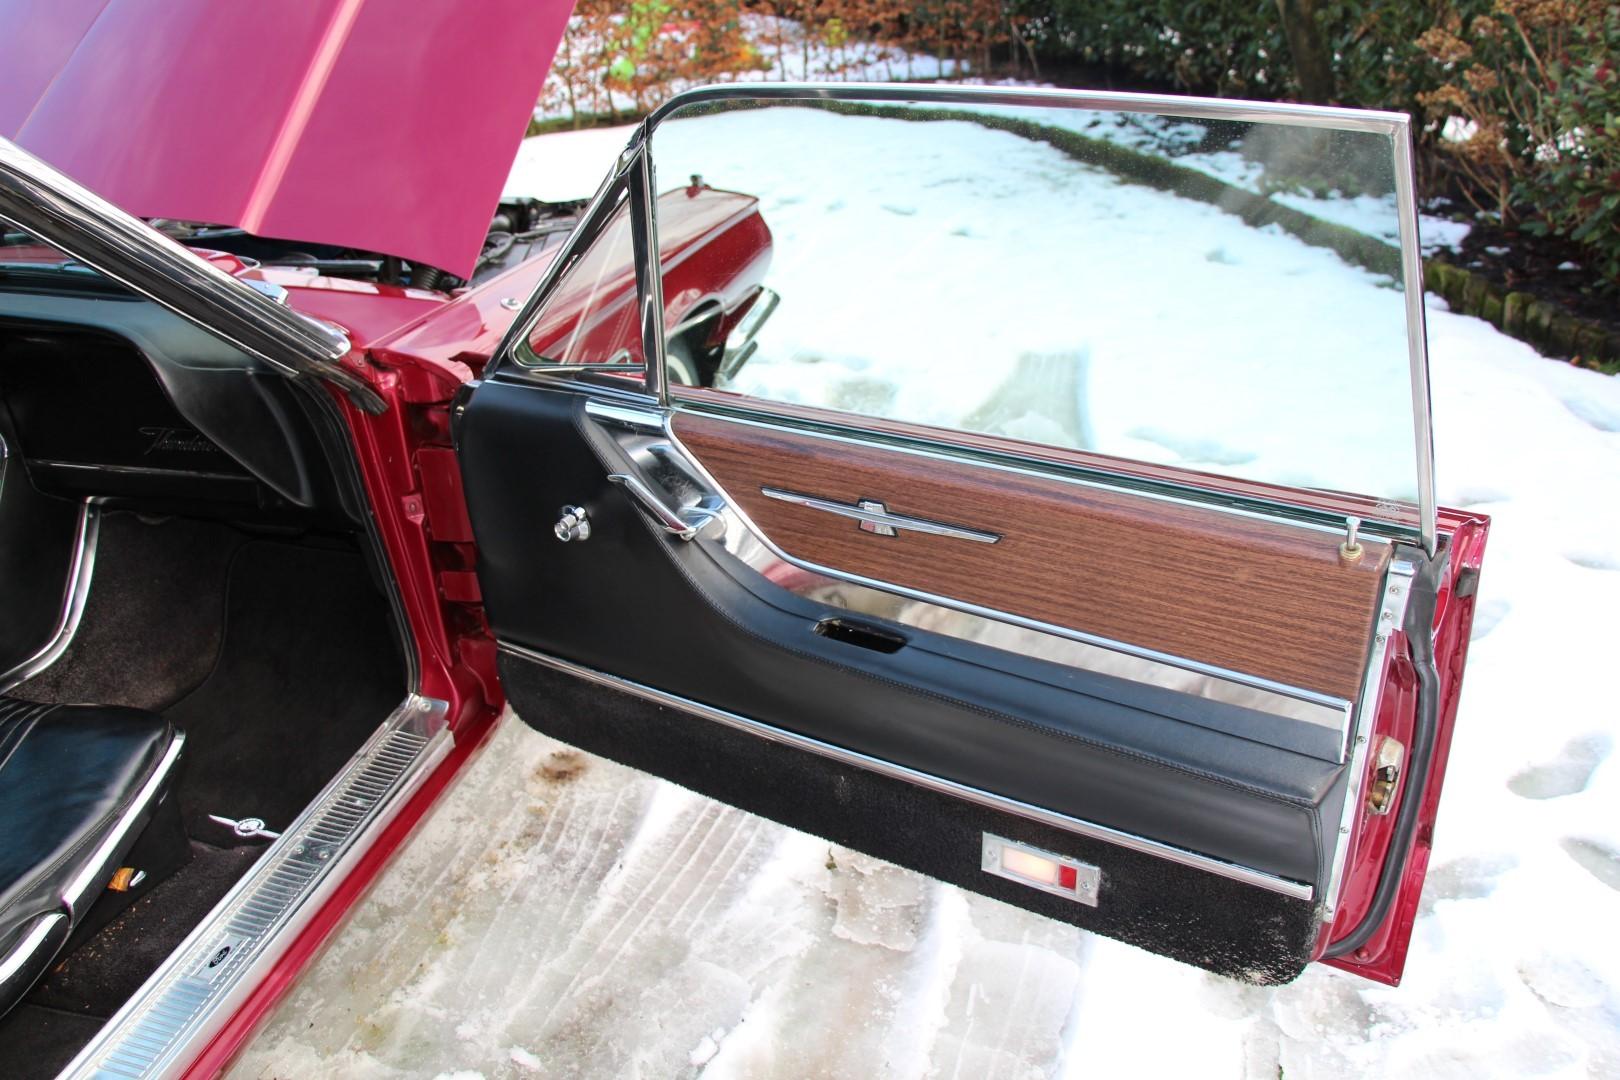 1965 Ford Thunderbird Hardtop - Burgundy new (5)